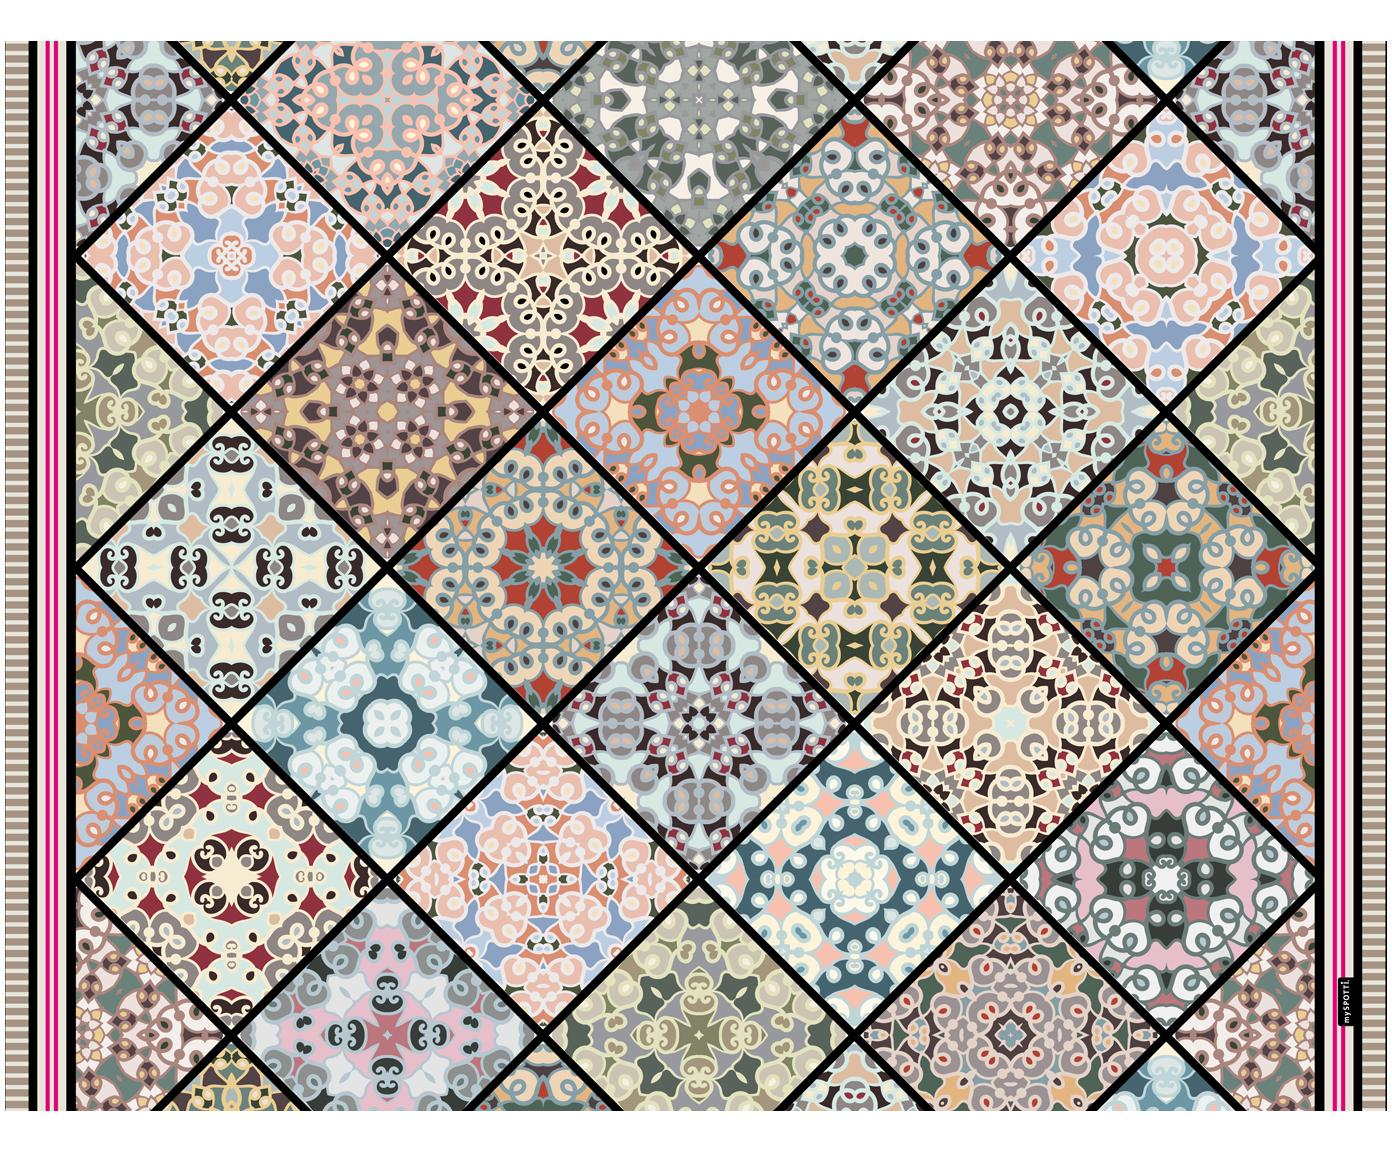 Vinyl vloermat Aylin, Recyclebaar vinyl, Multicolour, 65 x 85 cm